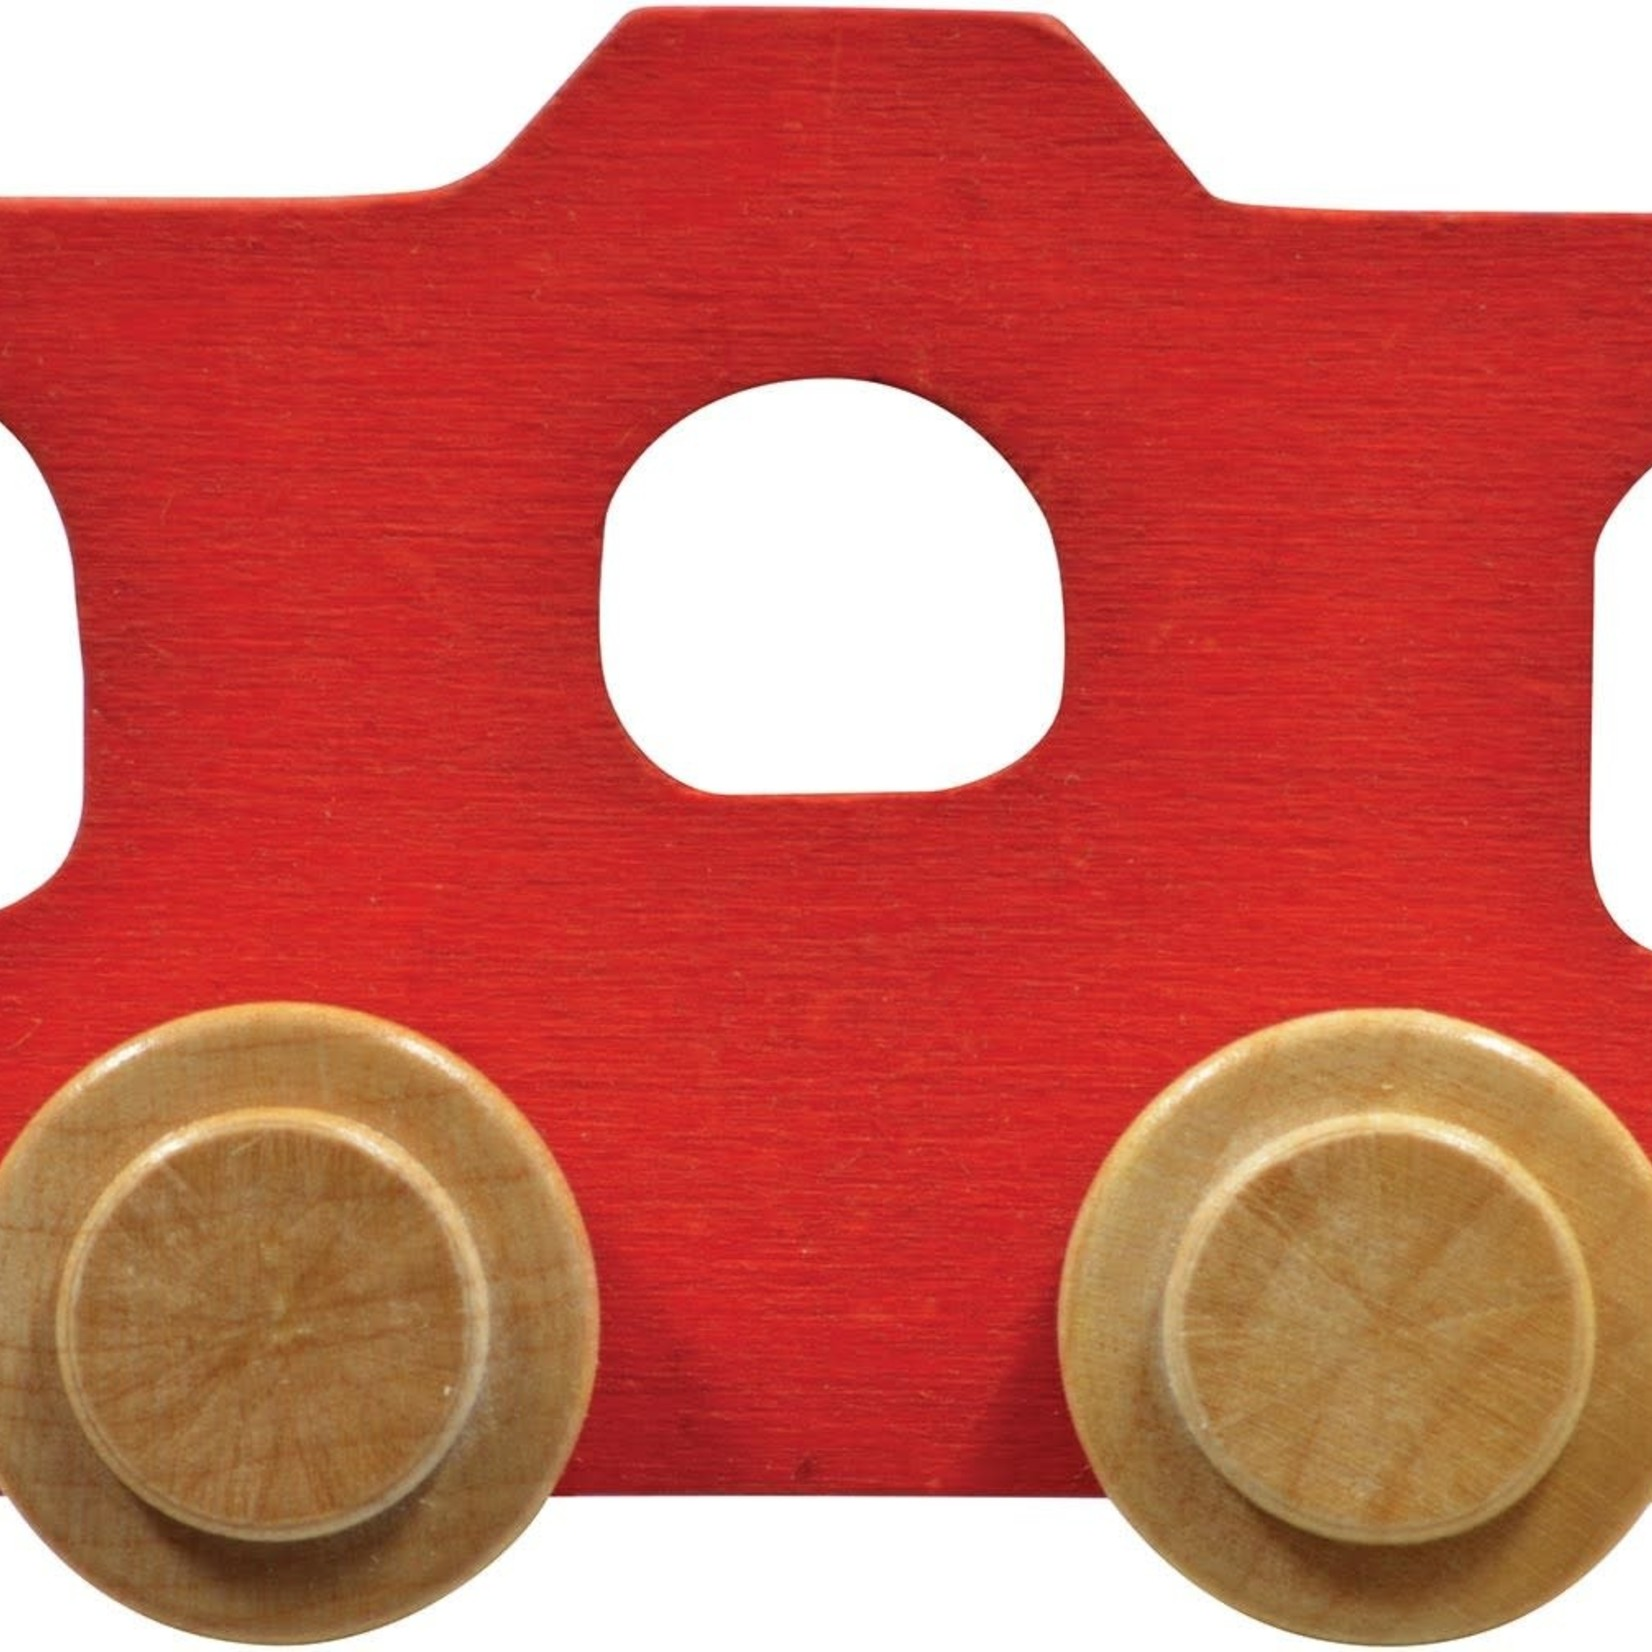 Maple Landmark Name Train - Caboose